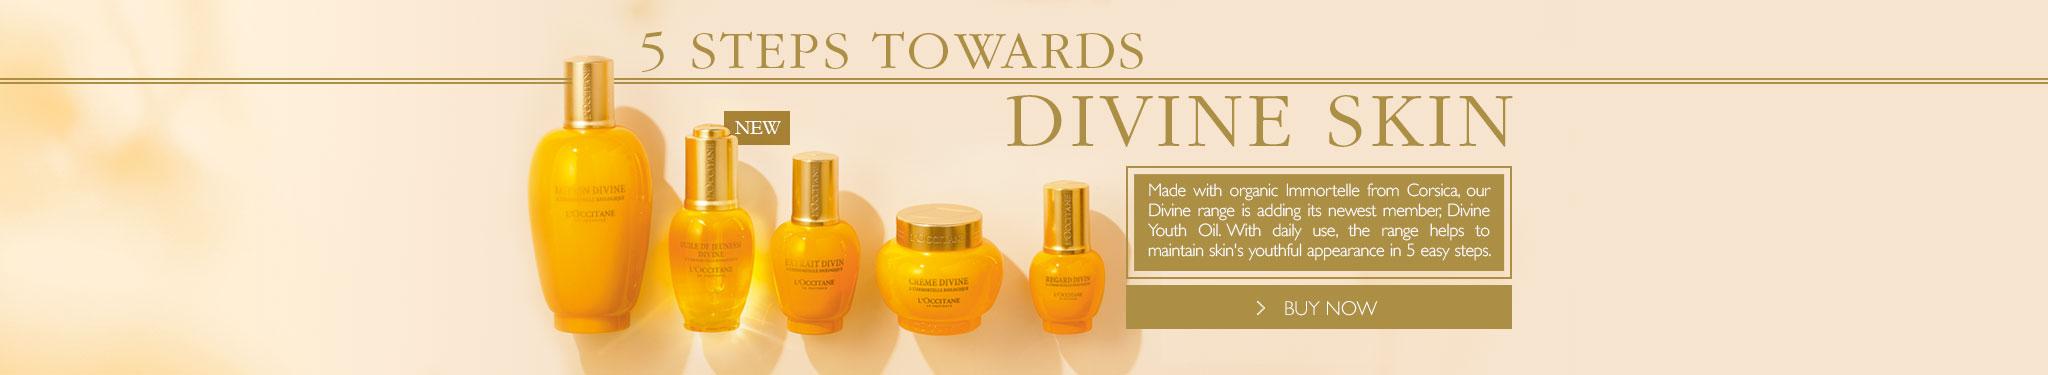 5 Steps to Divine Skin